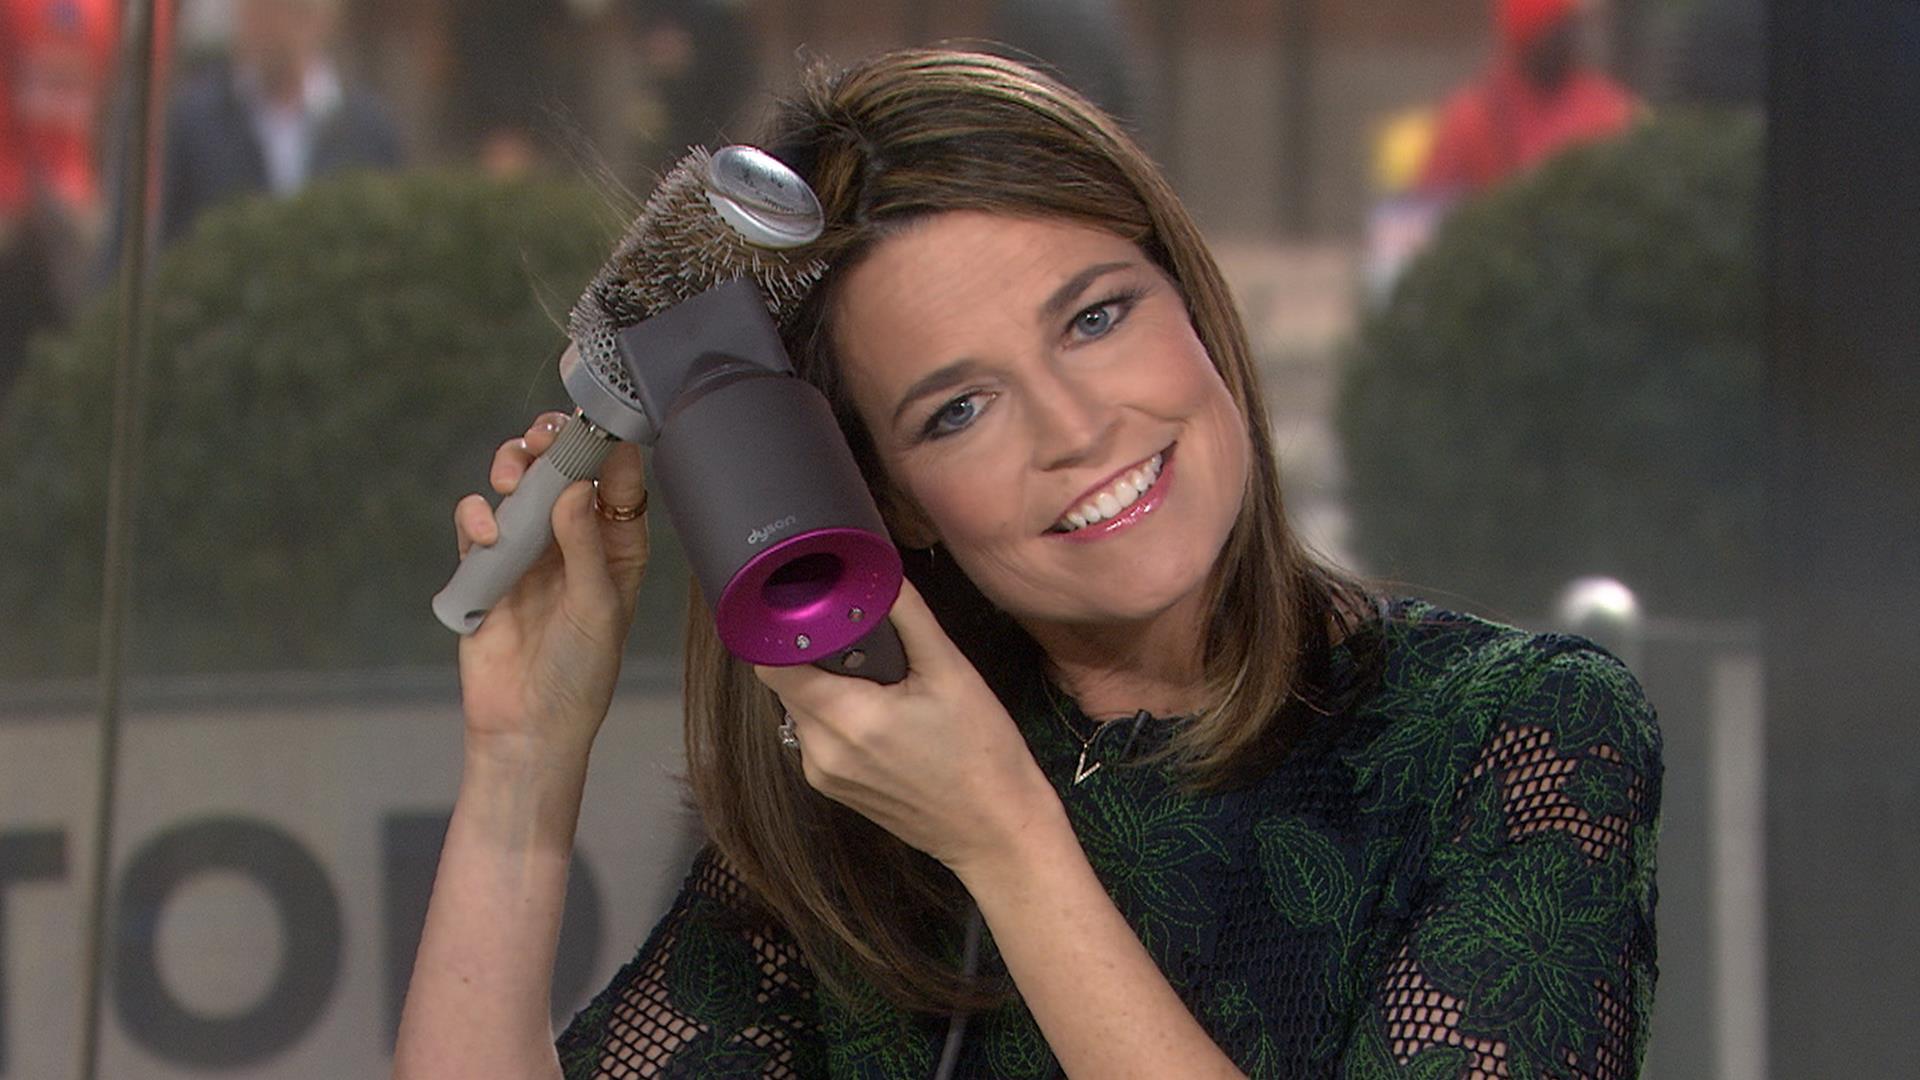 New Dyson hair dryer blows Savannah away - TODAY.com